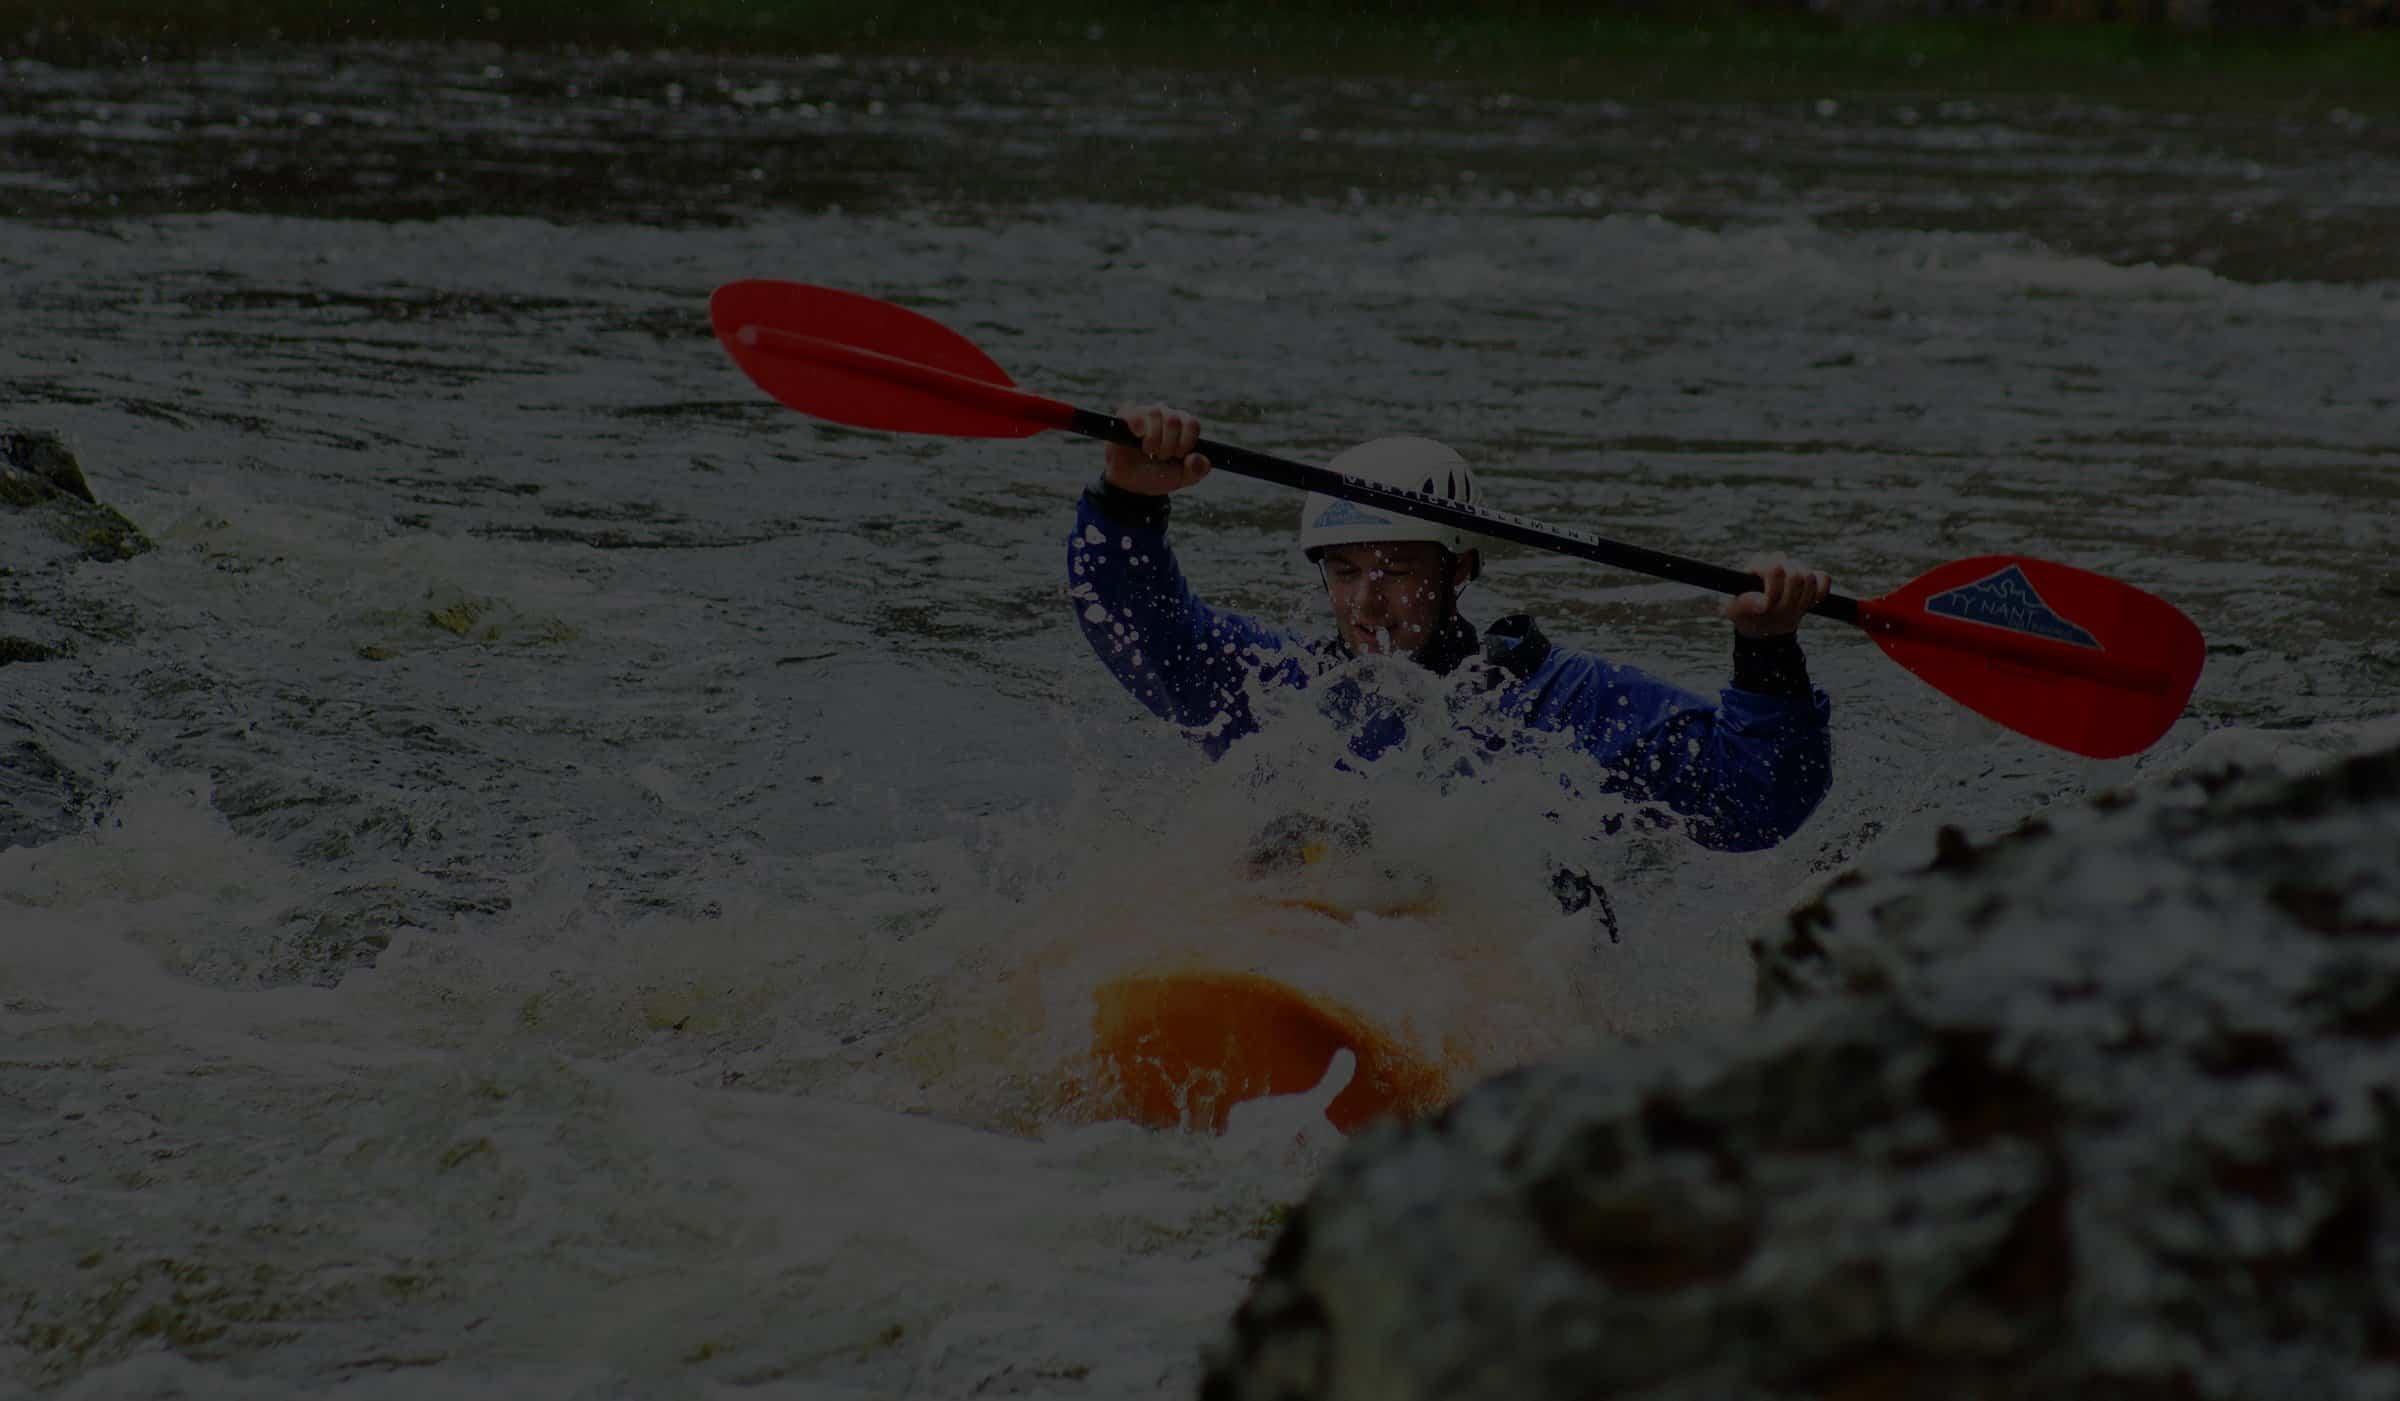 Man kayaking Llangollen